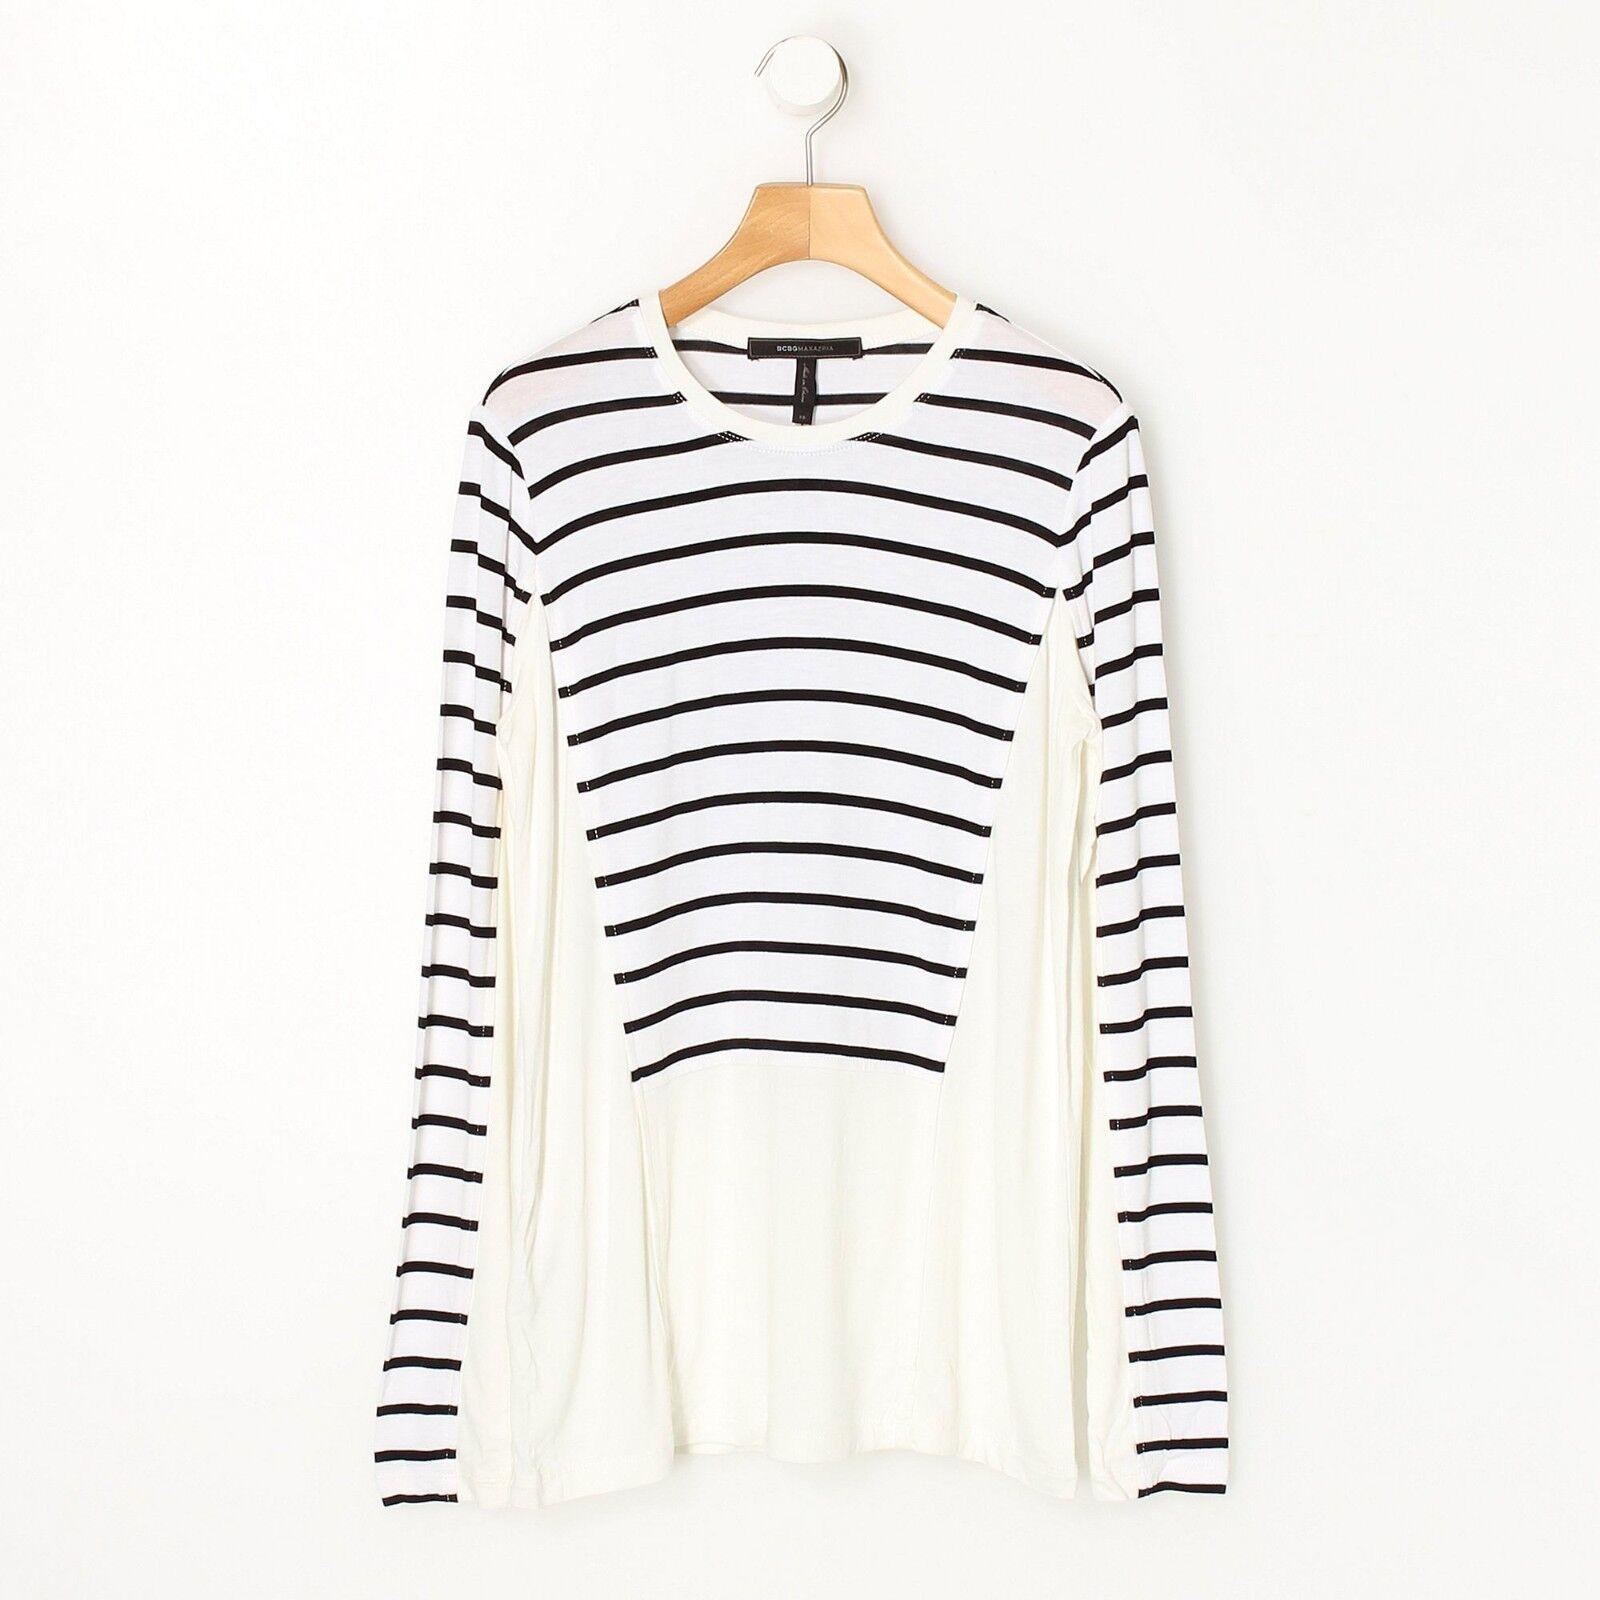 BCBG MAXAZRIA damen Fashion Morgin Strip Soft Knit Sweater Top Shirt New